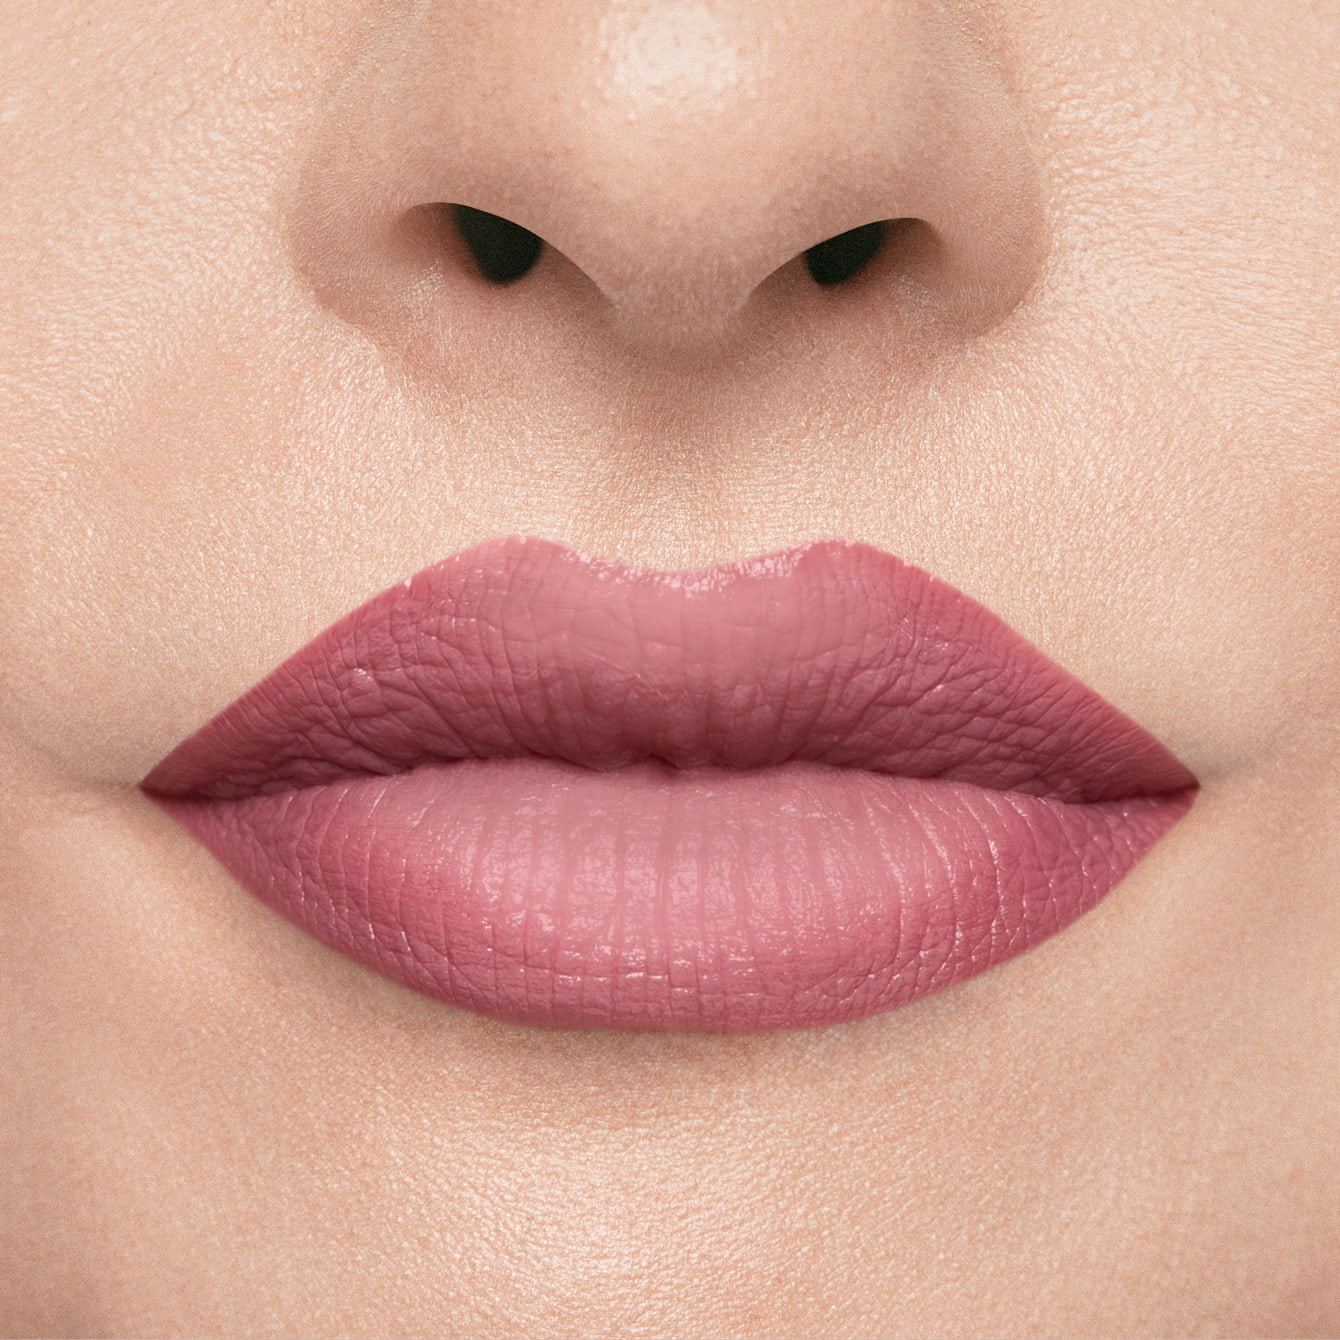 NEO Make Up Pomadka powiększająca usta Shape Up Effect Lipstick 22 Happiness NEO MAKE UP 7957